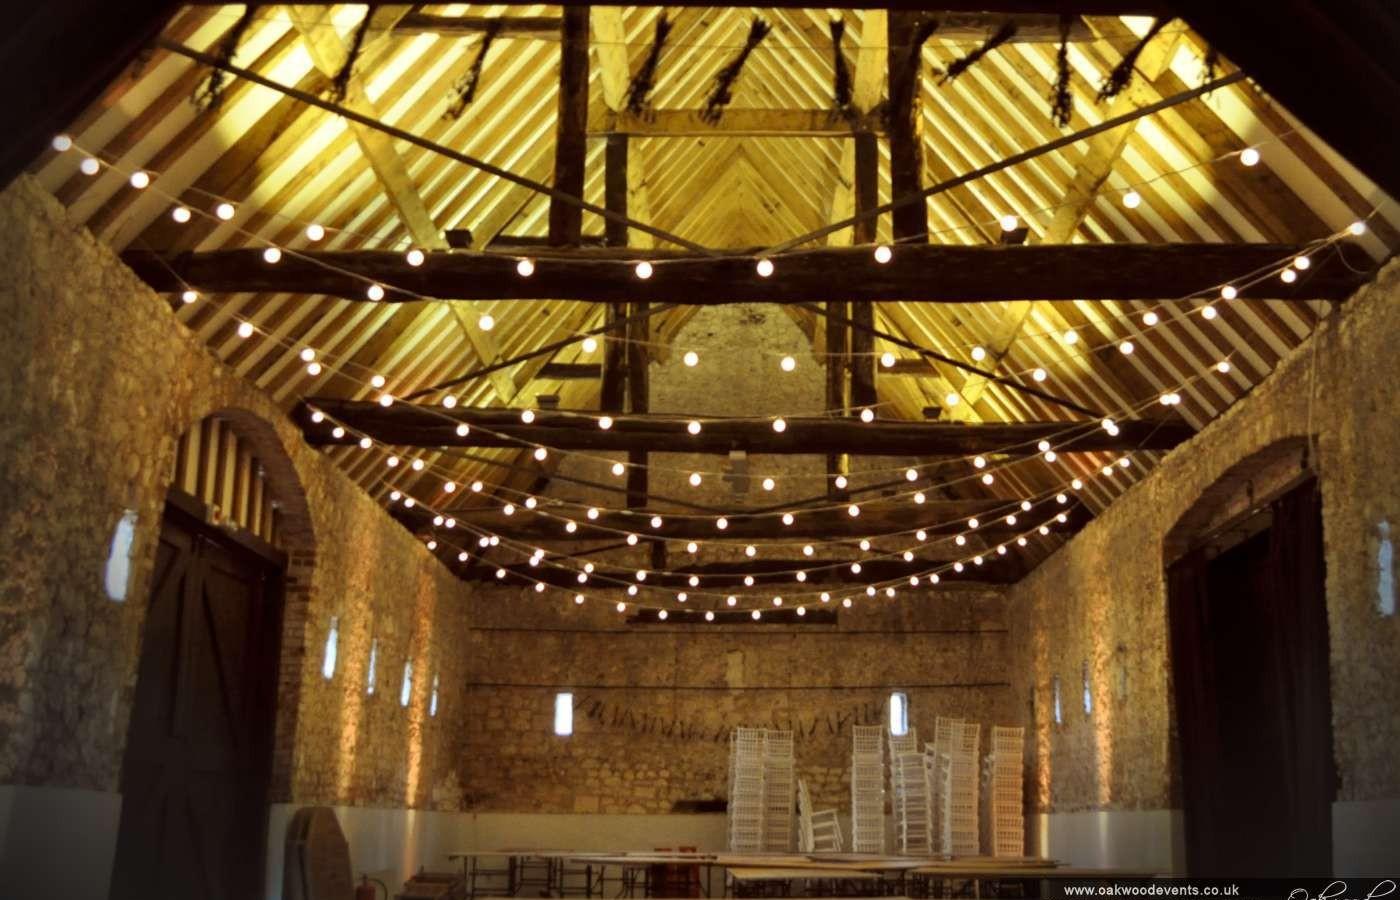 Festoon Lights For A Barn Wedding & Outdoor Festoon Lighting - Democraciaejustica